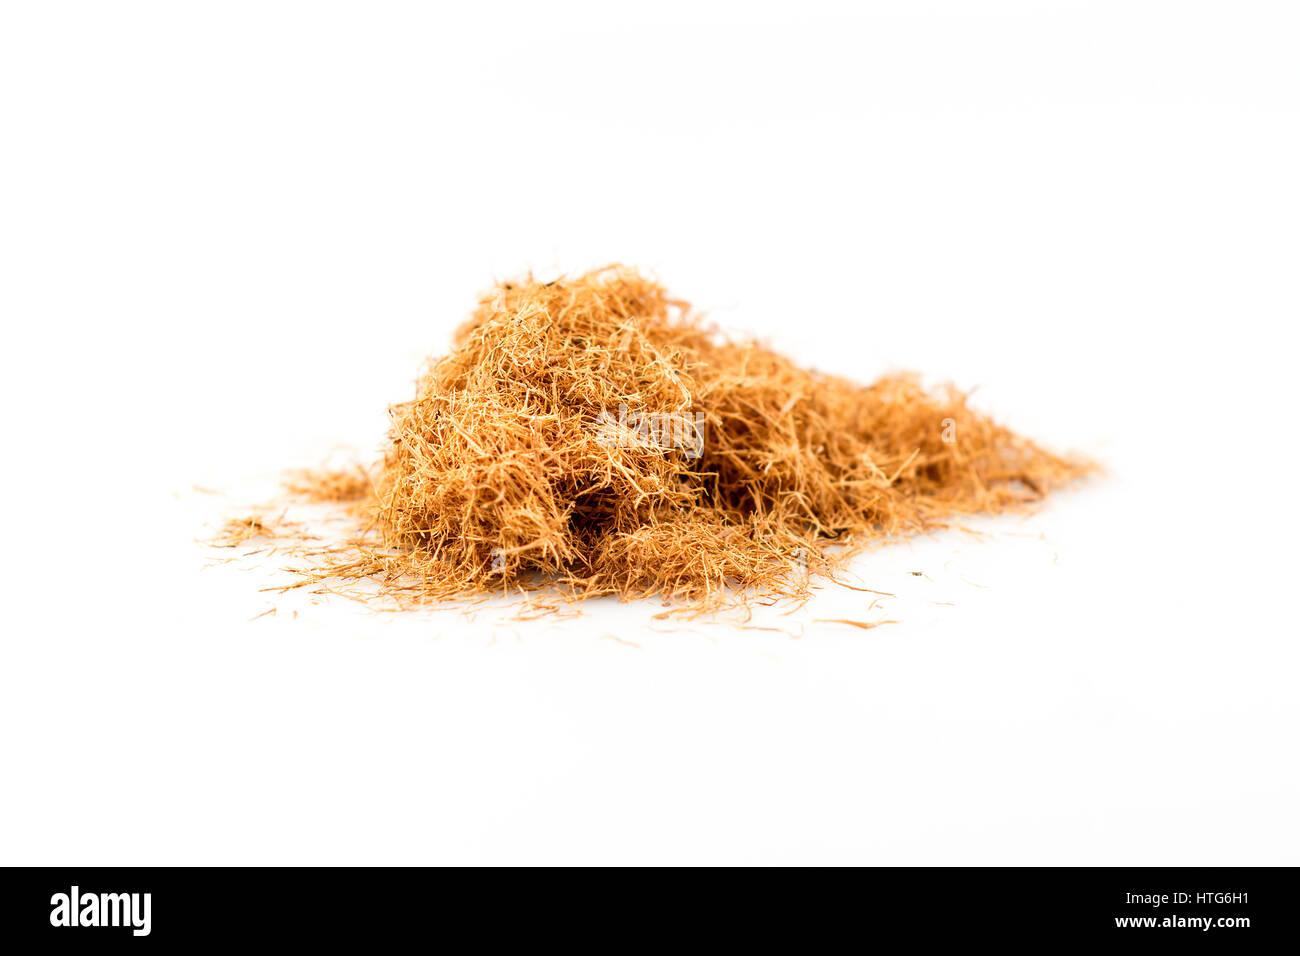 Cats Claw Bark - Stock Image